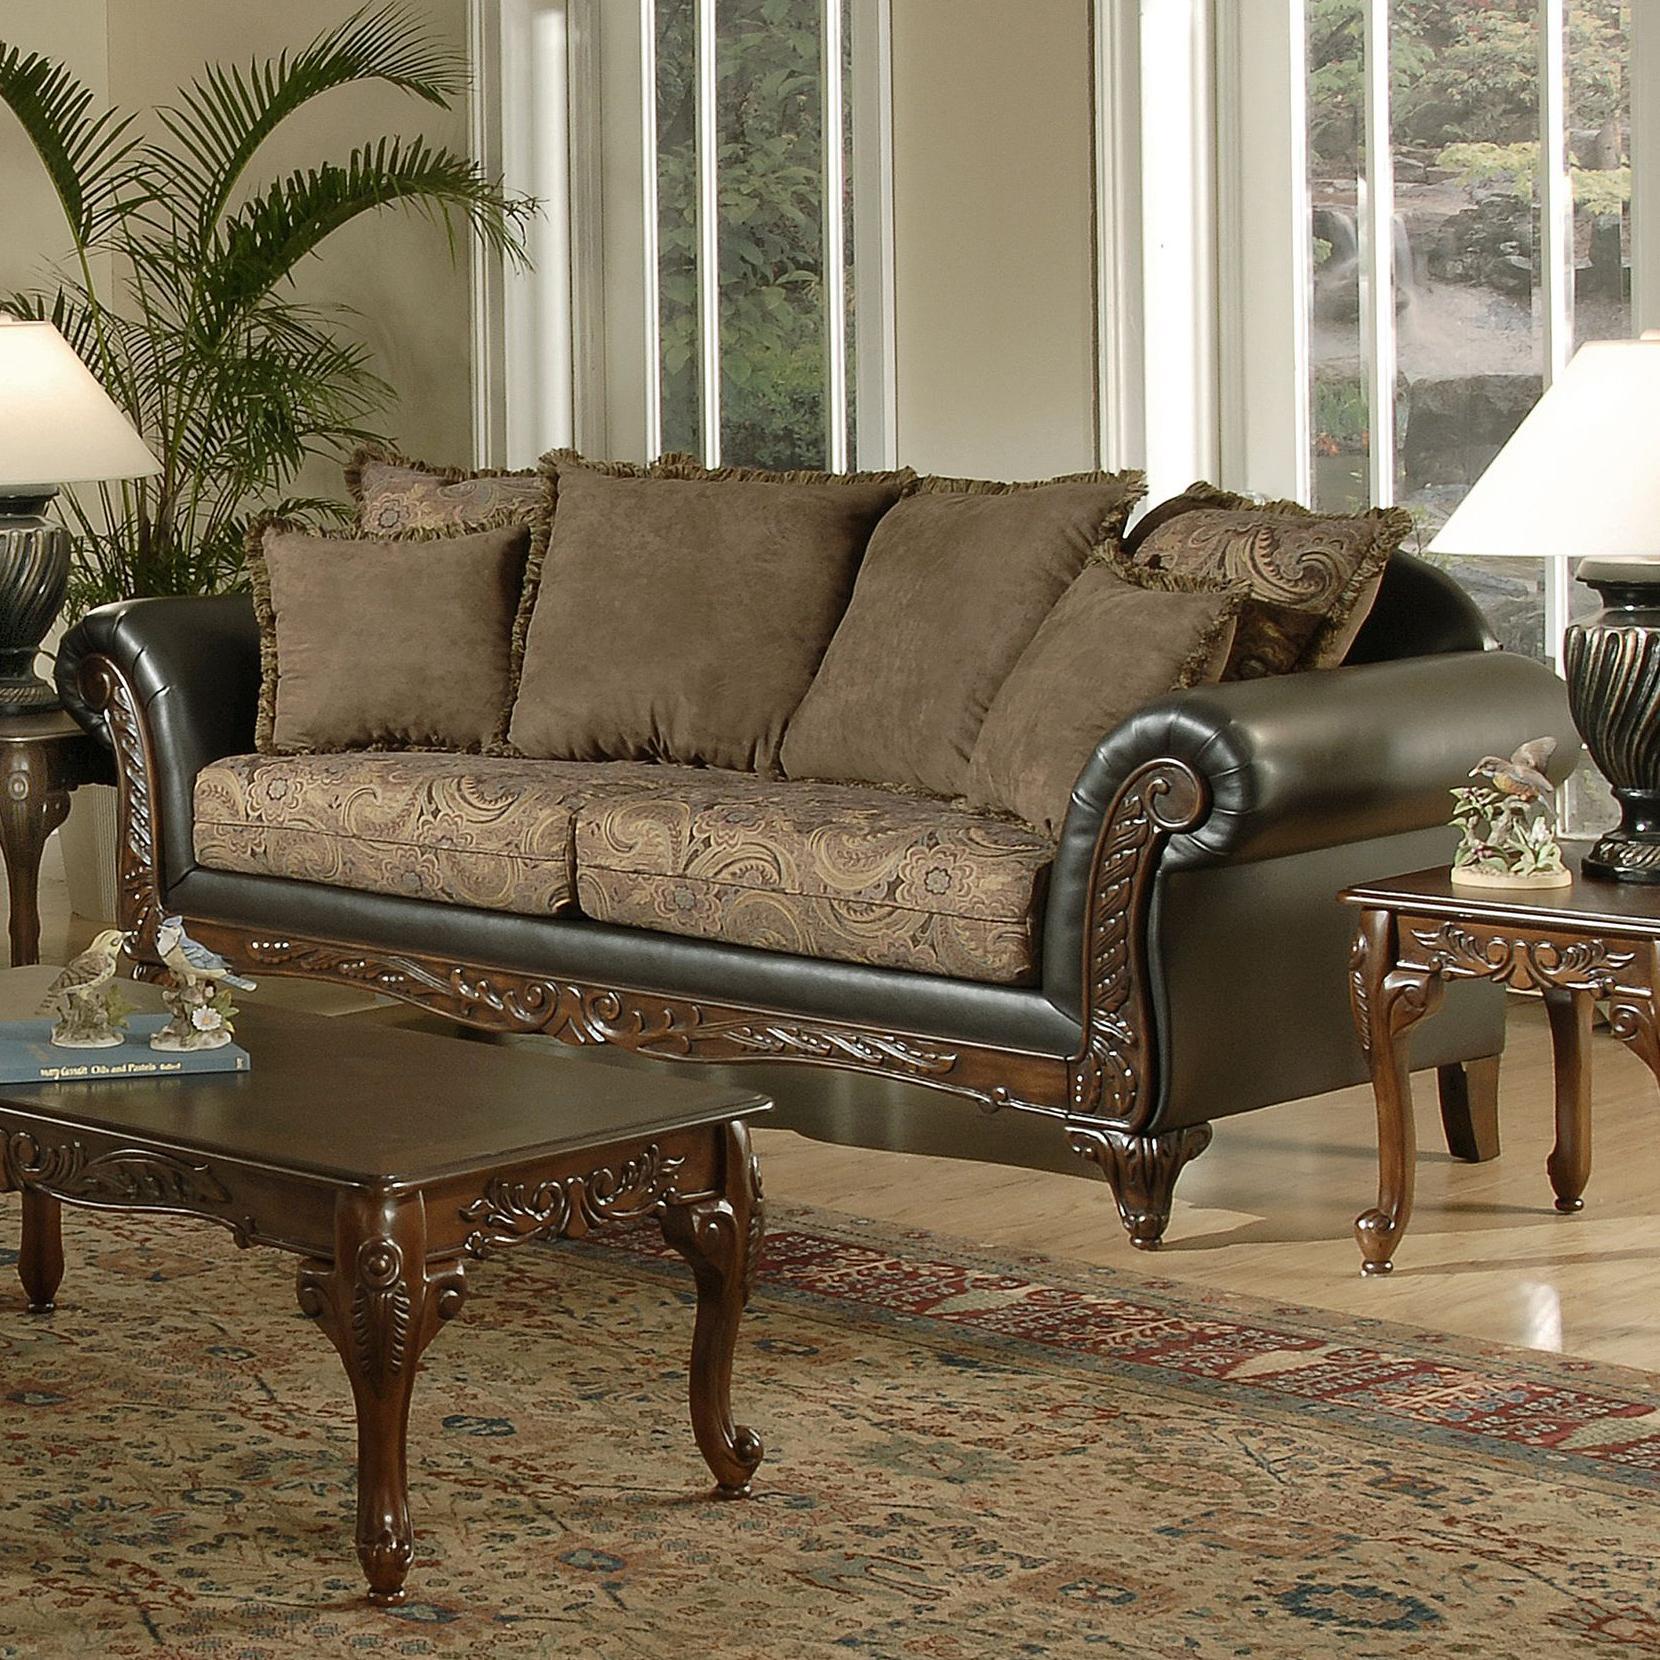 7685 Pillow Back Sofa by Hughes Furniture at Lapeer Furniture & Mattress Center